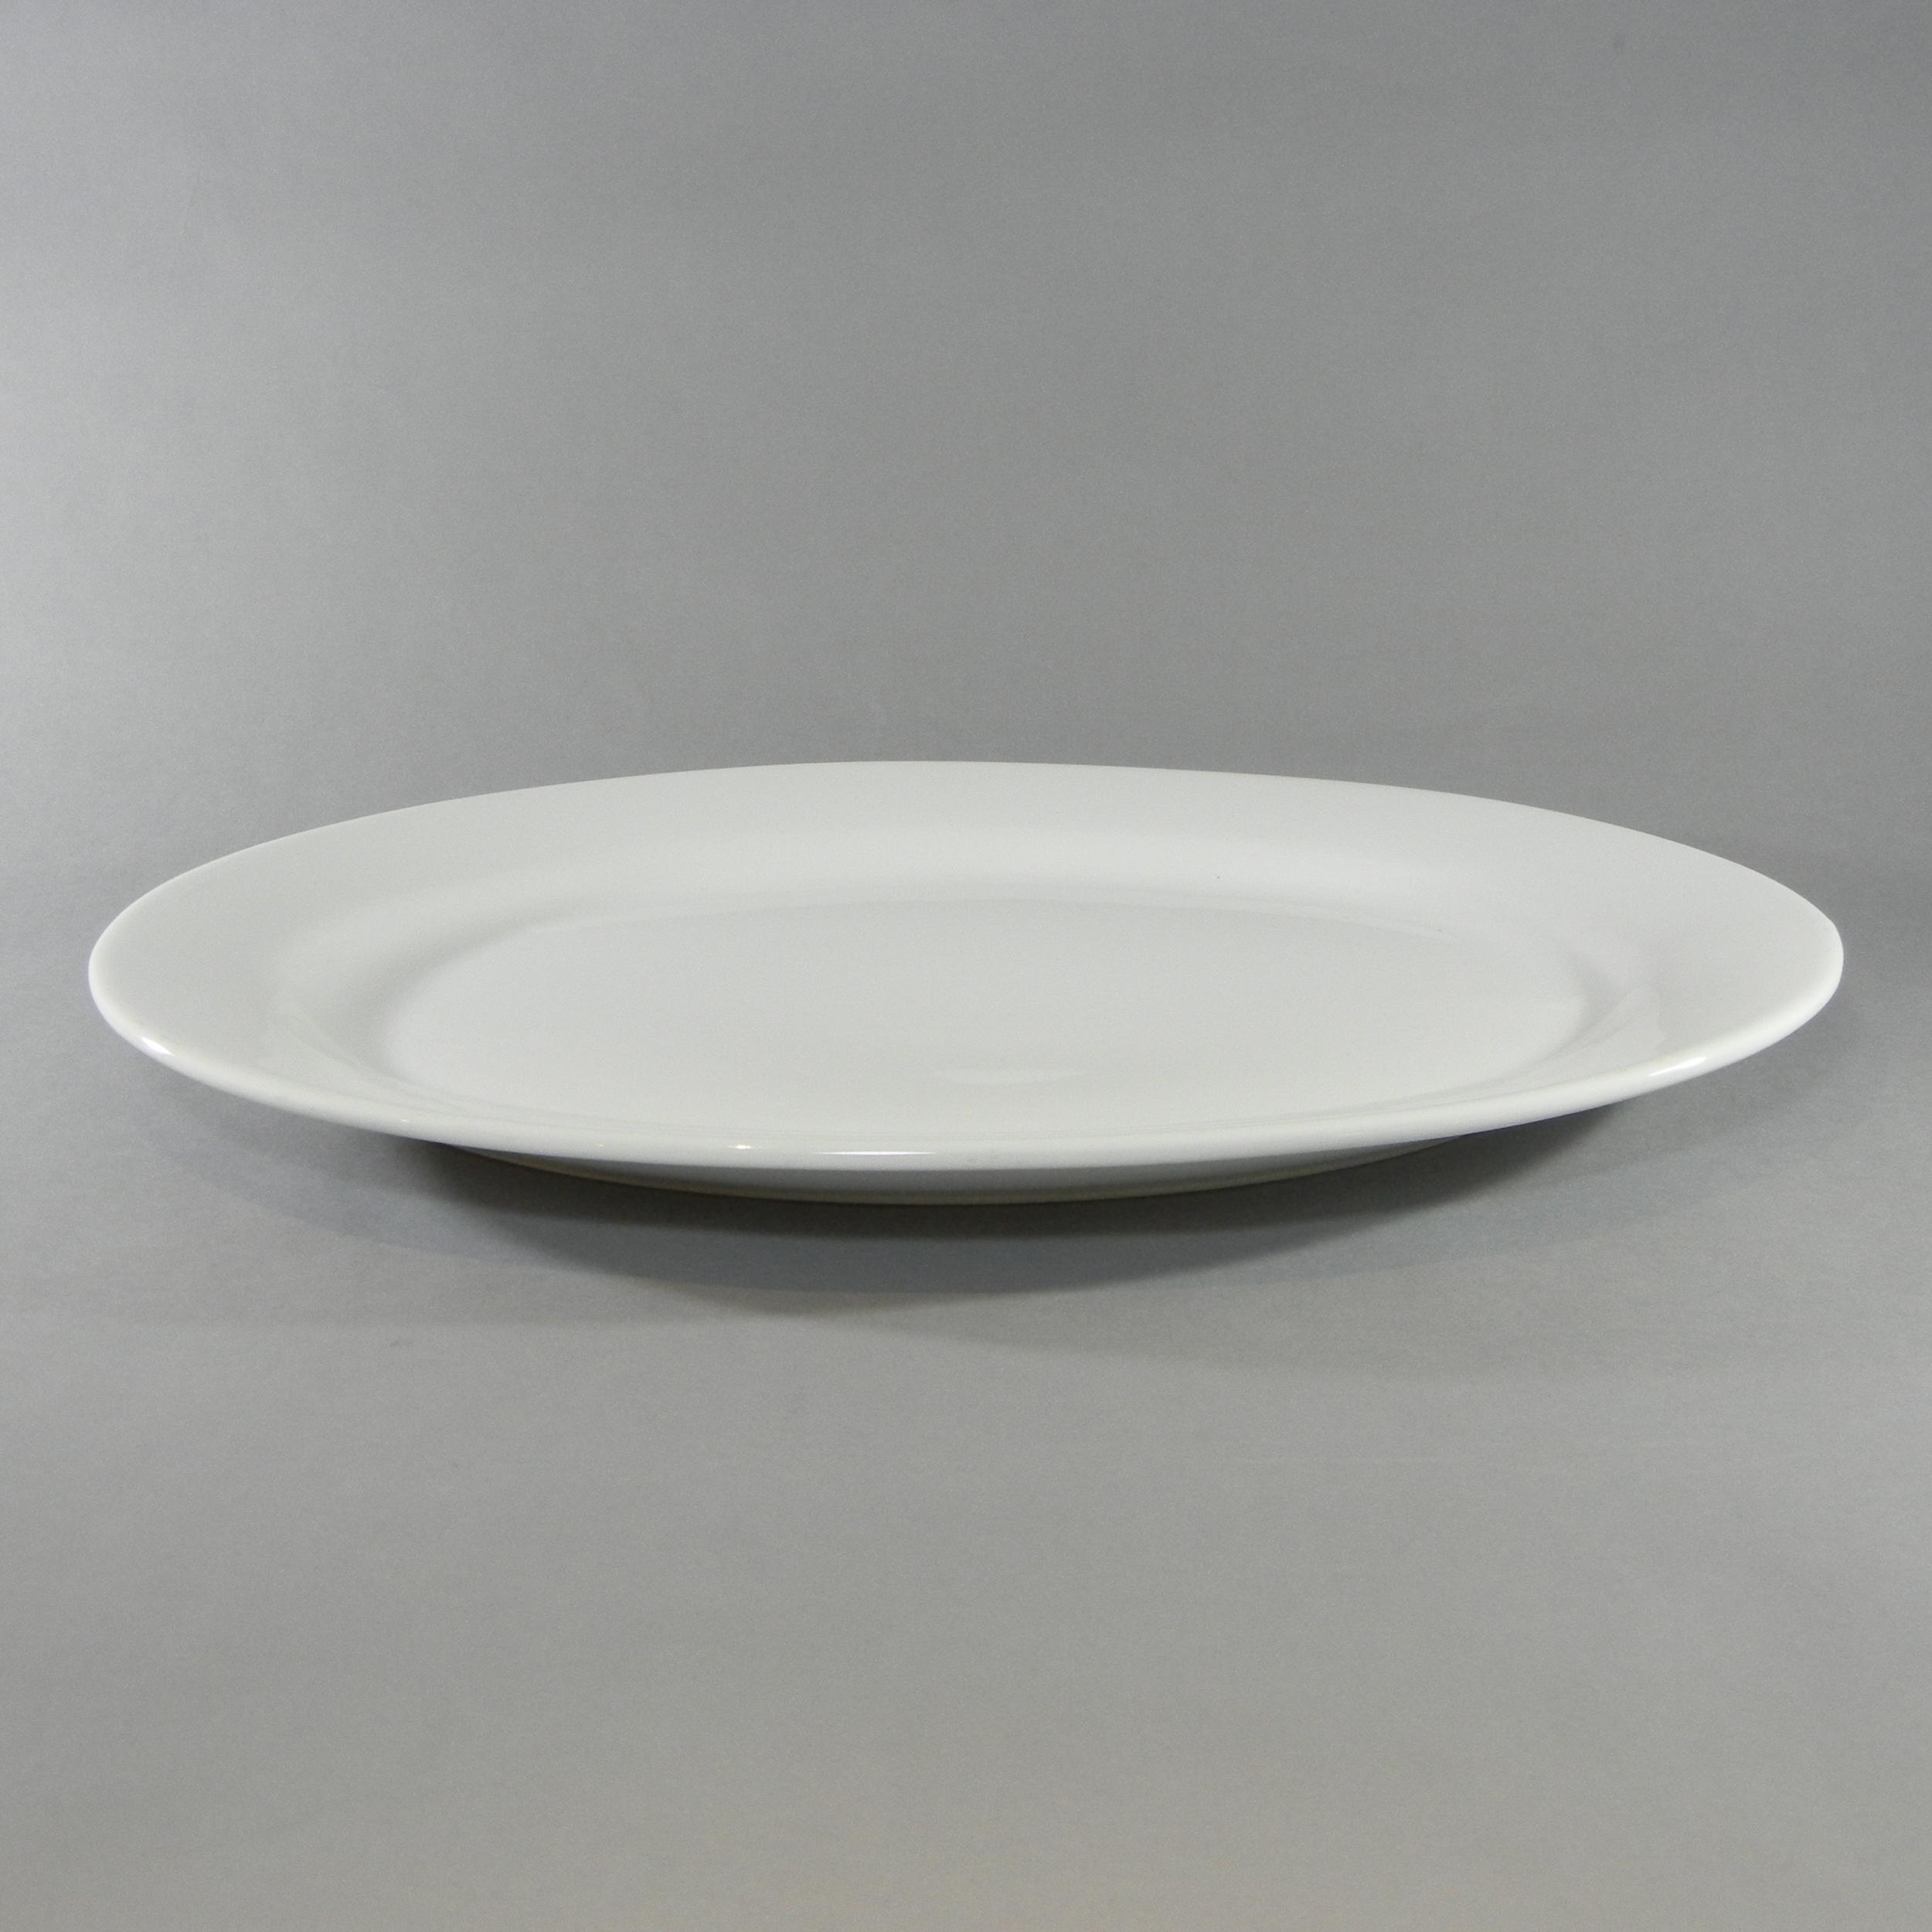 Oval Platter - J(18''x13'')